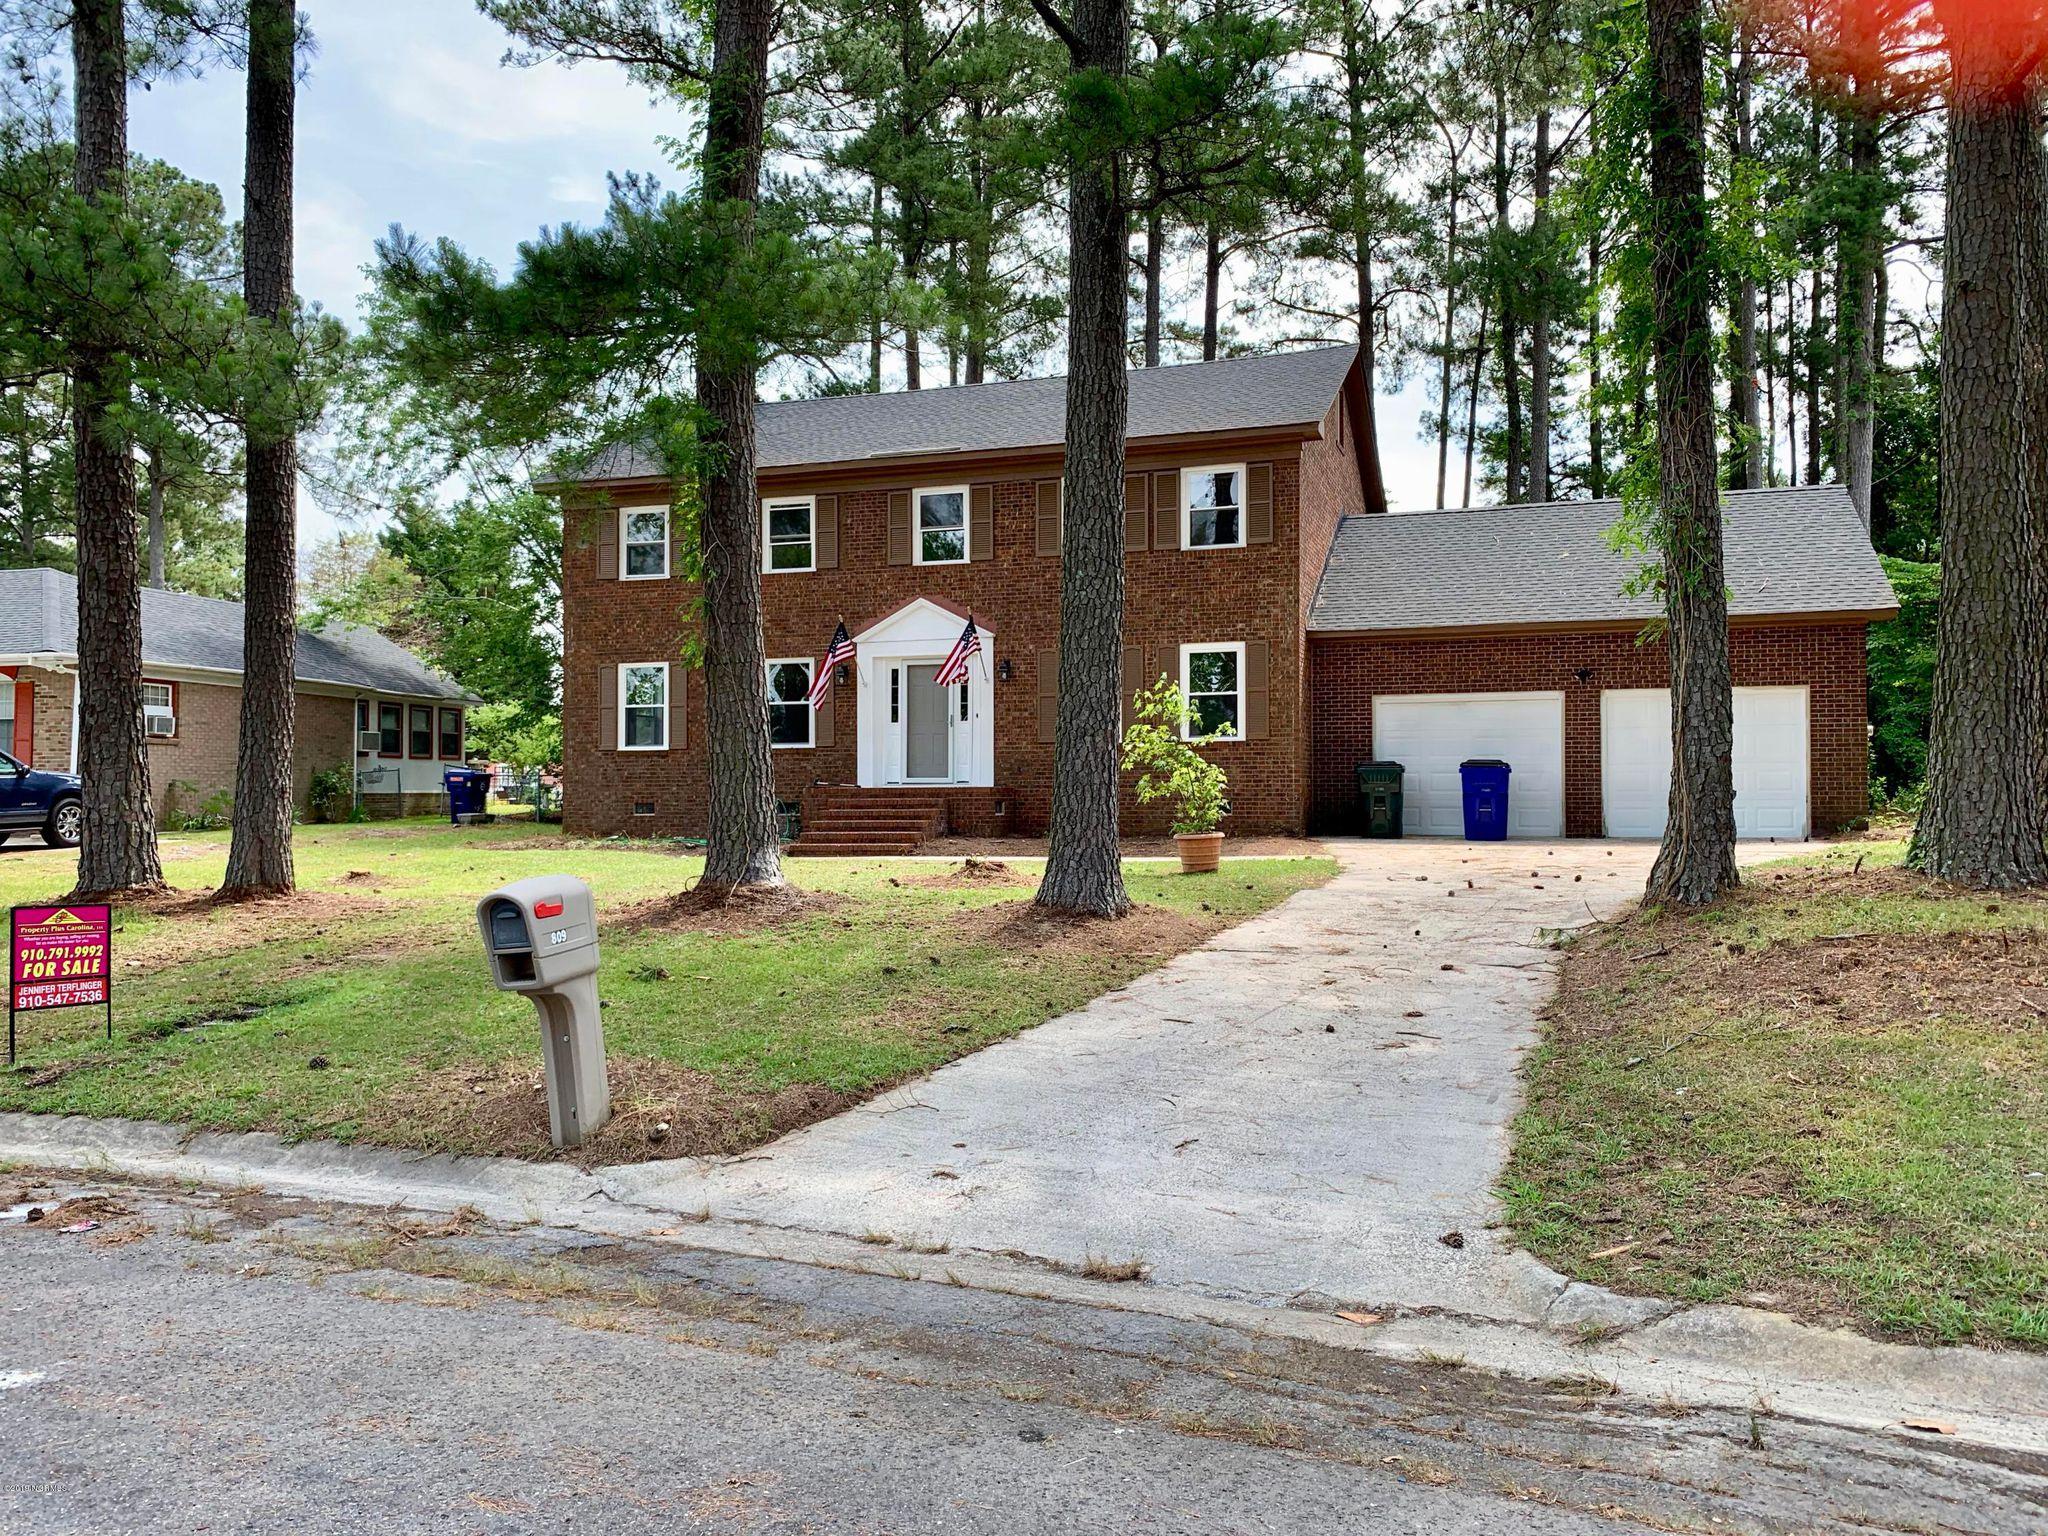 809 Eagle Rd, Kinston, NC 28501 - 4 Bed, 3 Bath Single-Family Home - MLS  #100169119 - 49 Photos | Trulia